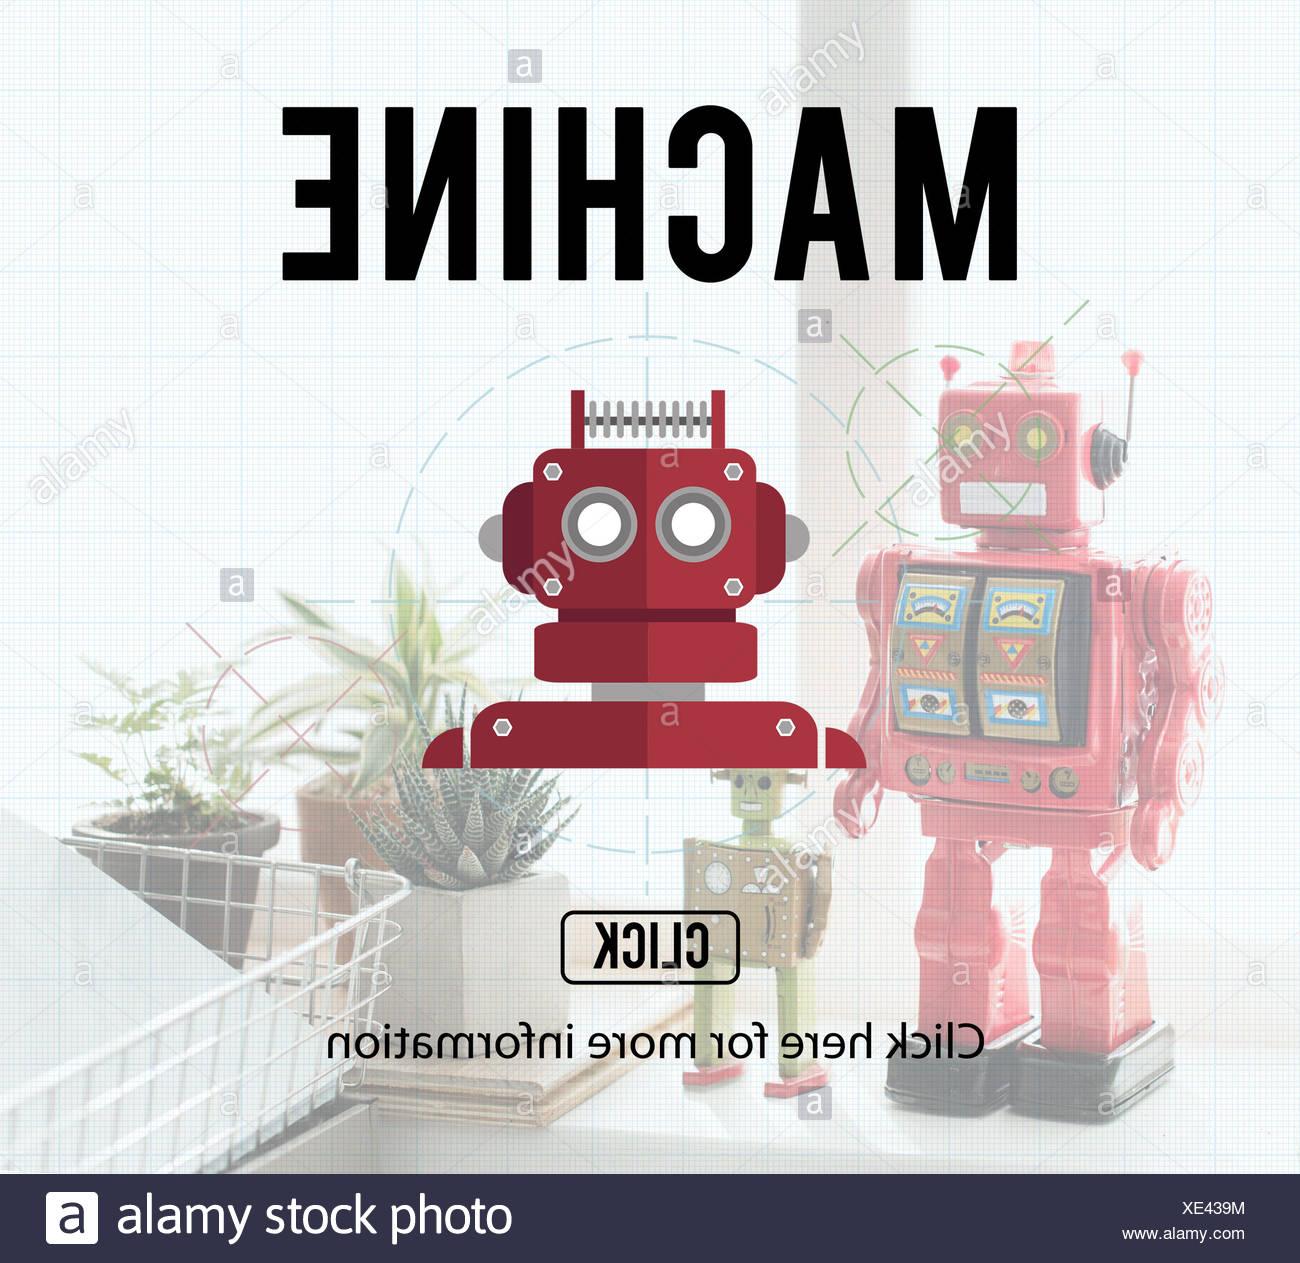 Robot Cyborg Ai Robotics Android Concept Stock Photo 284061504 Alamy